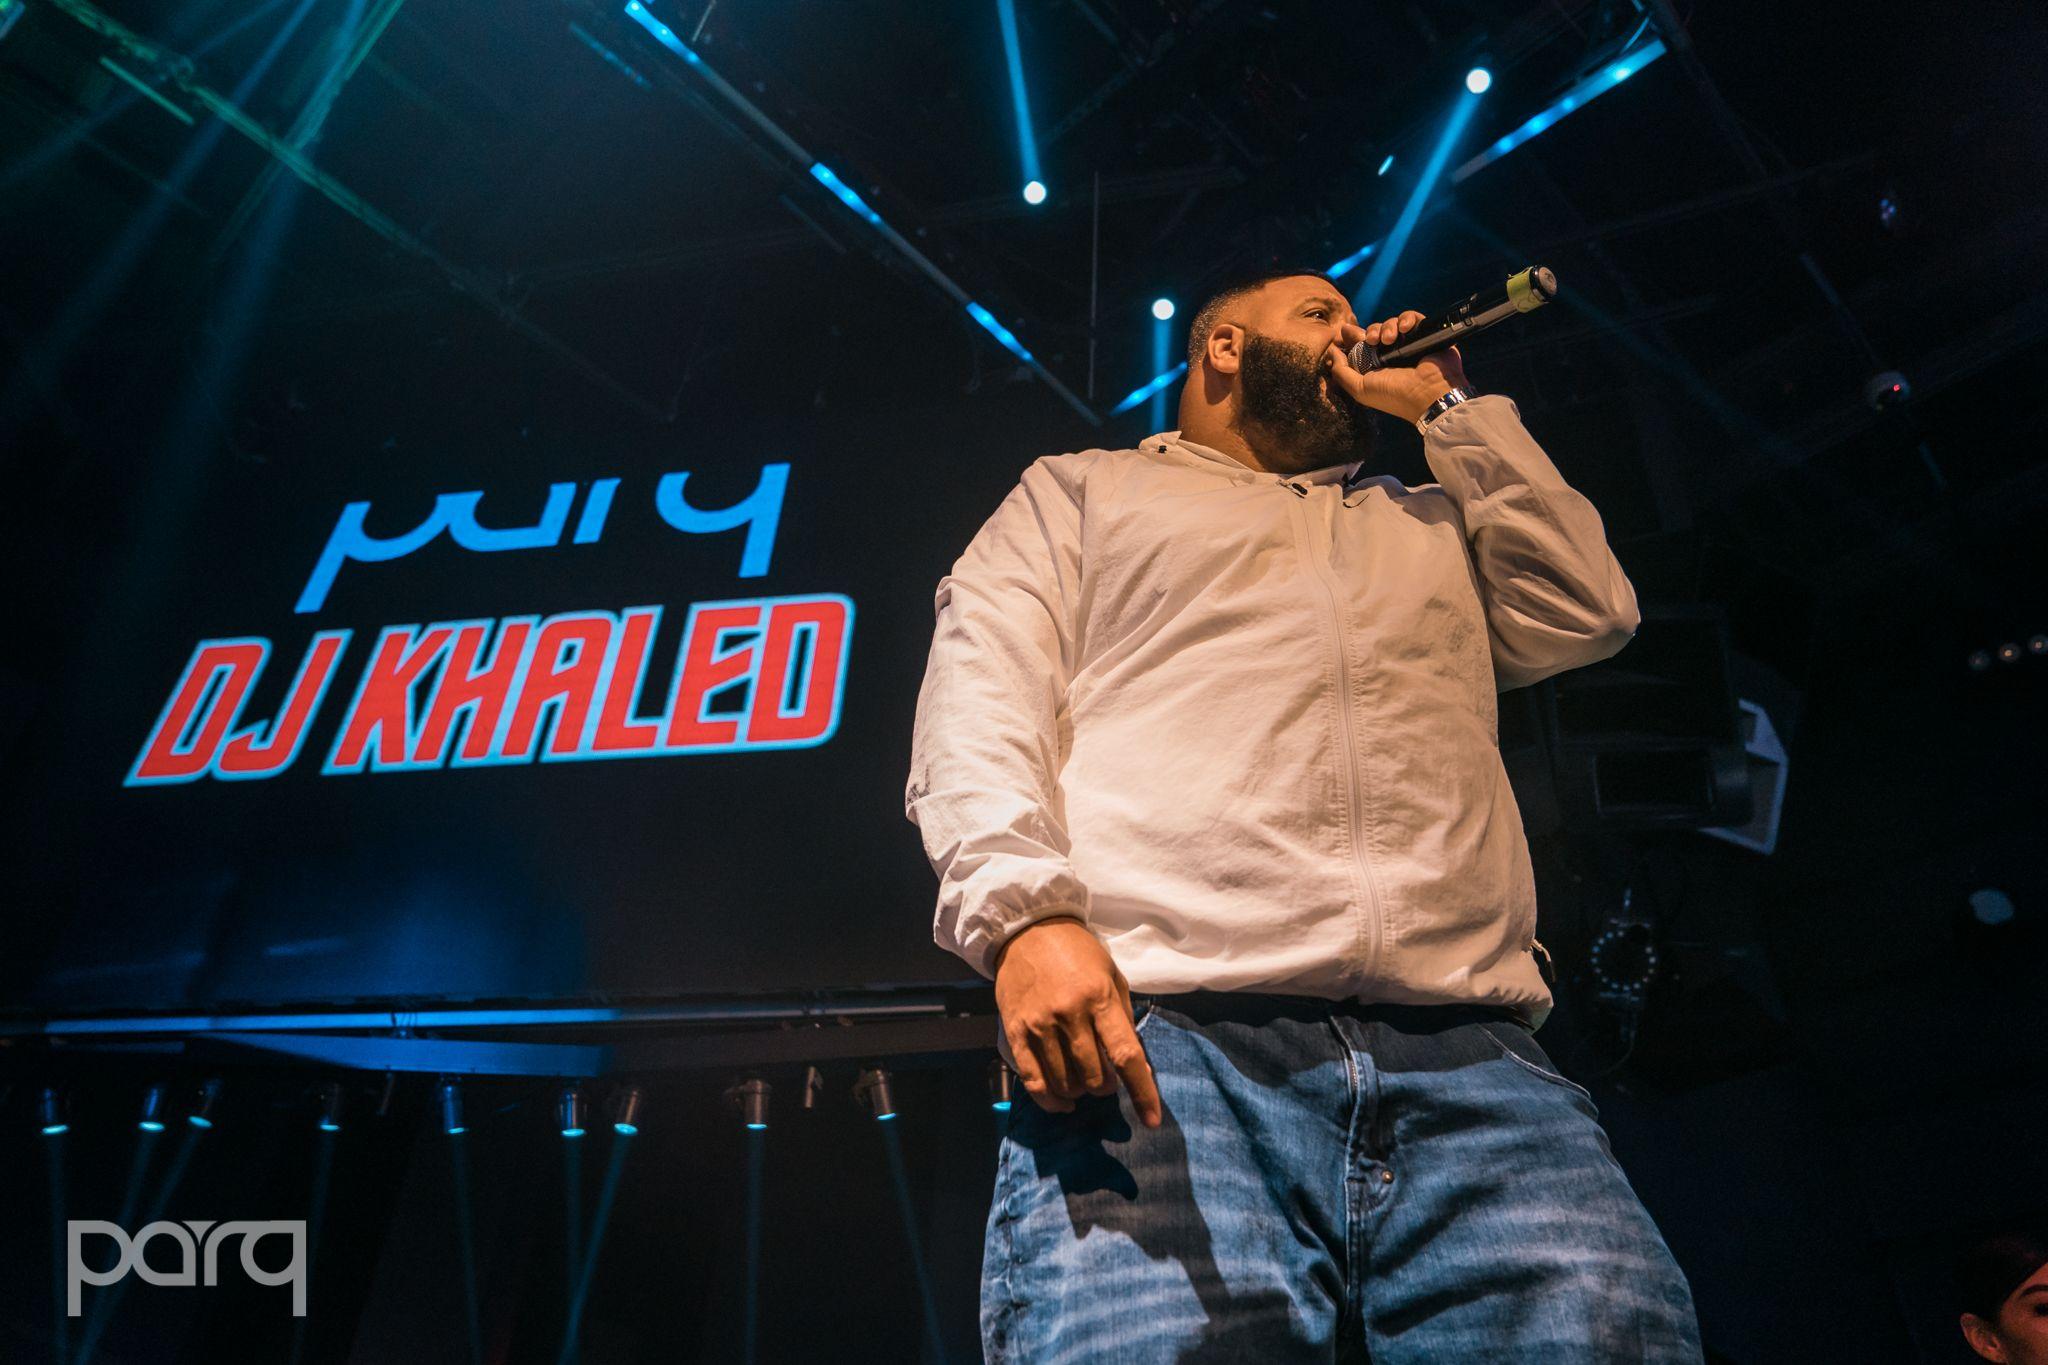 09.27.18 Parq - DJ Khaled-2.jpg